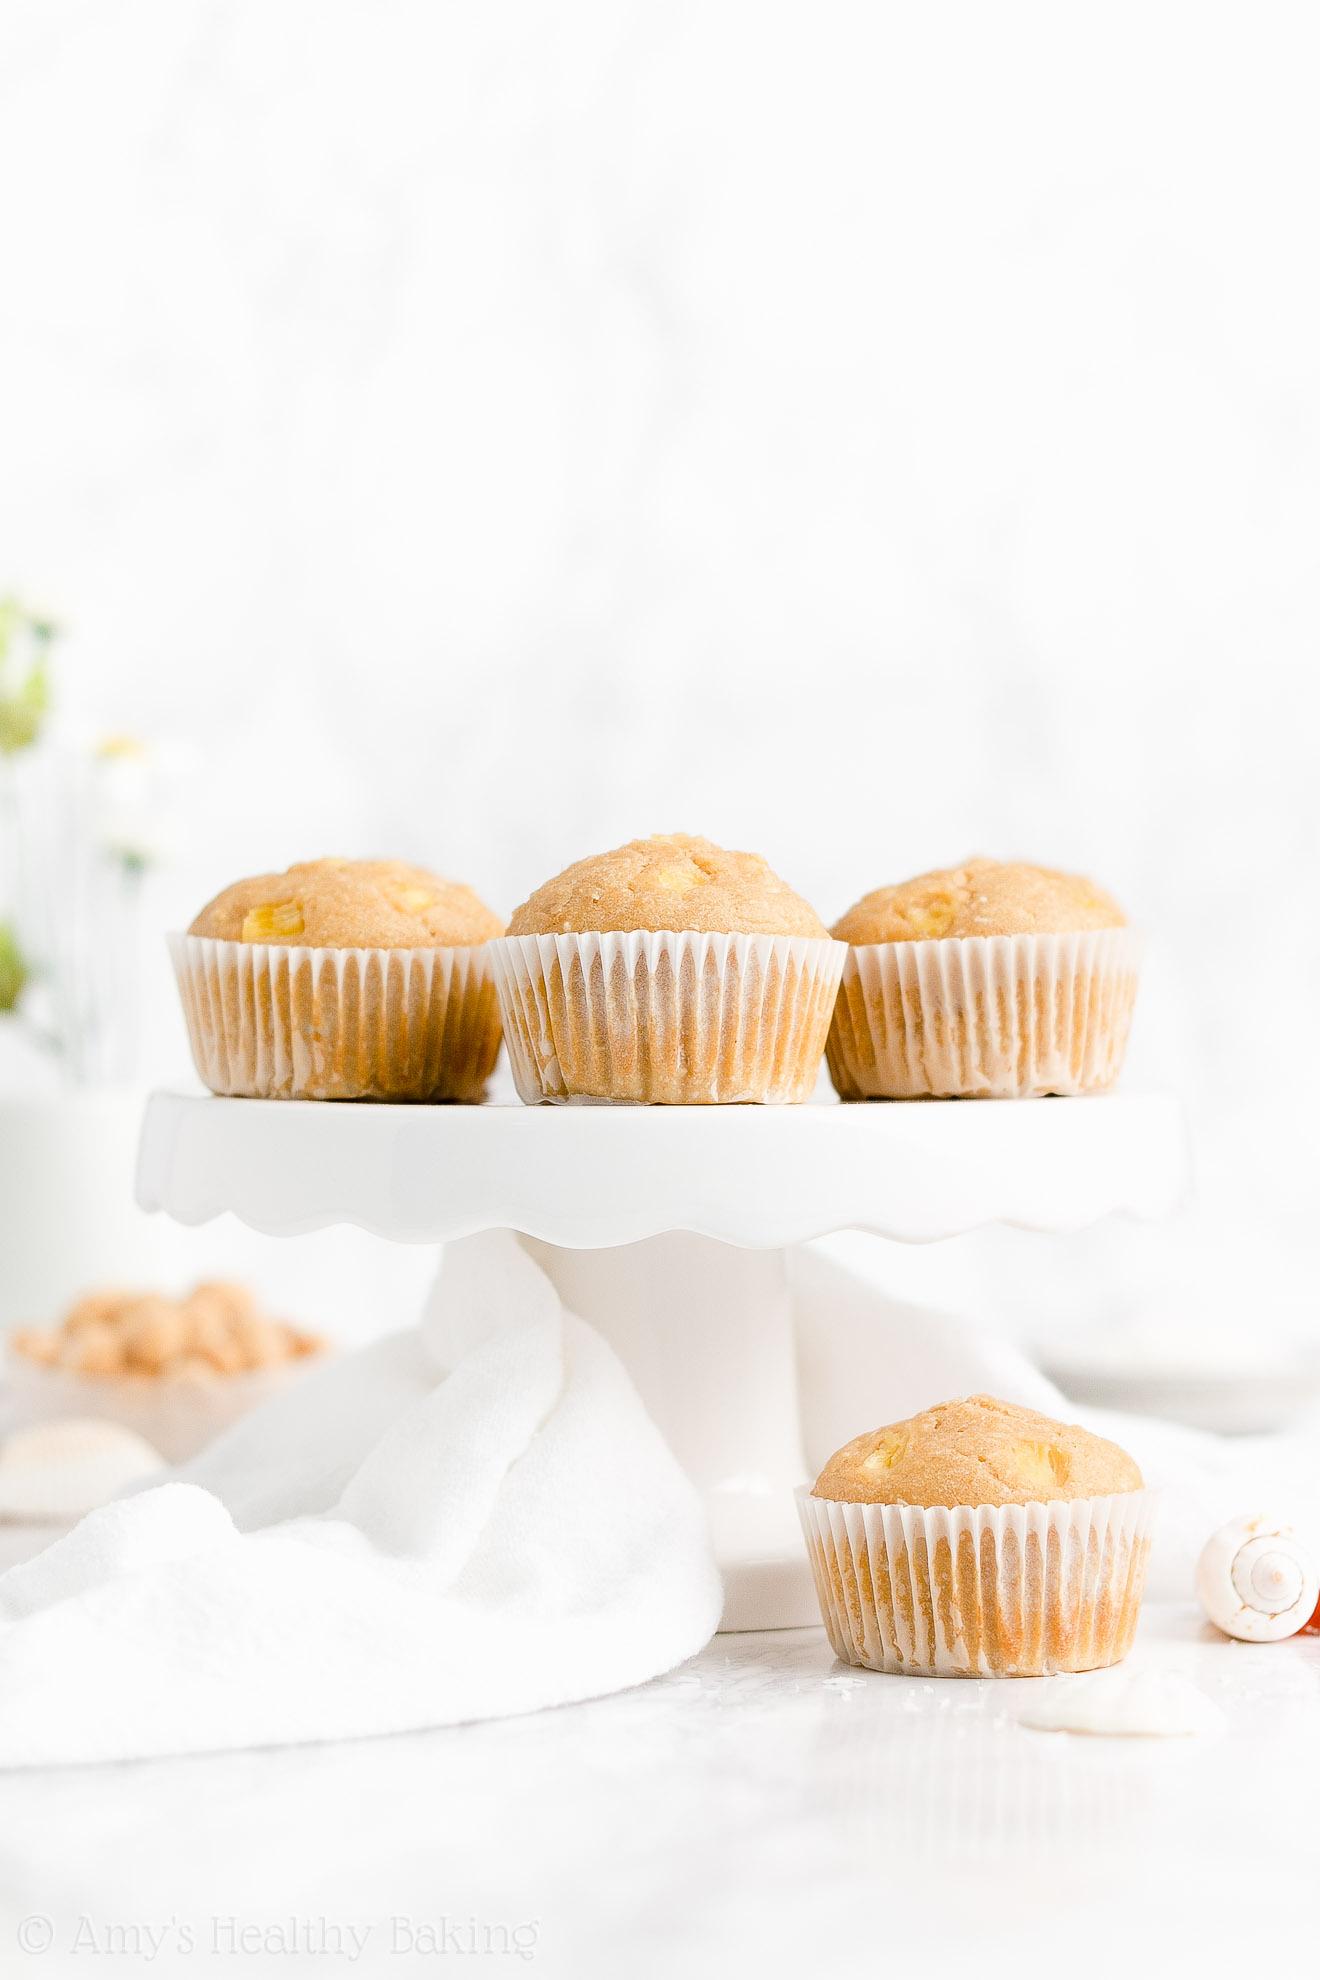 Clean Eating Healthy Sugar Free Pineapple, Coconut & Macadamia Nut Muffins